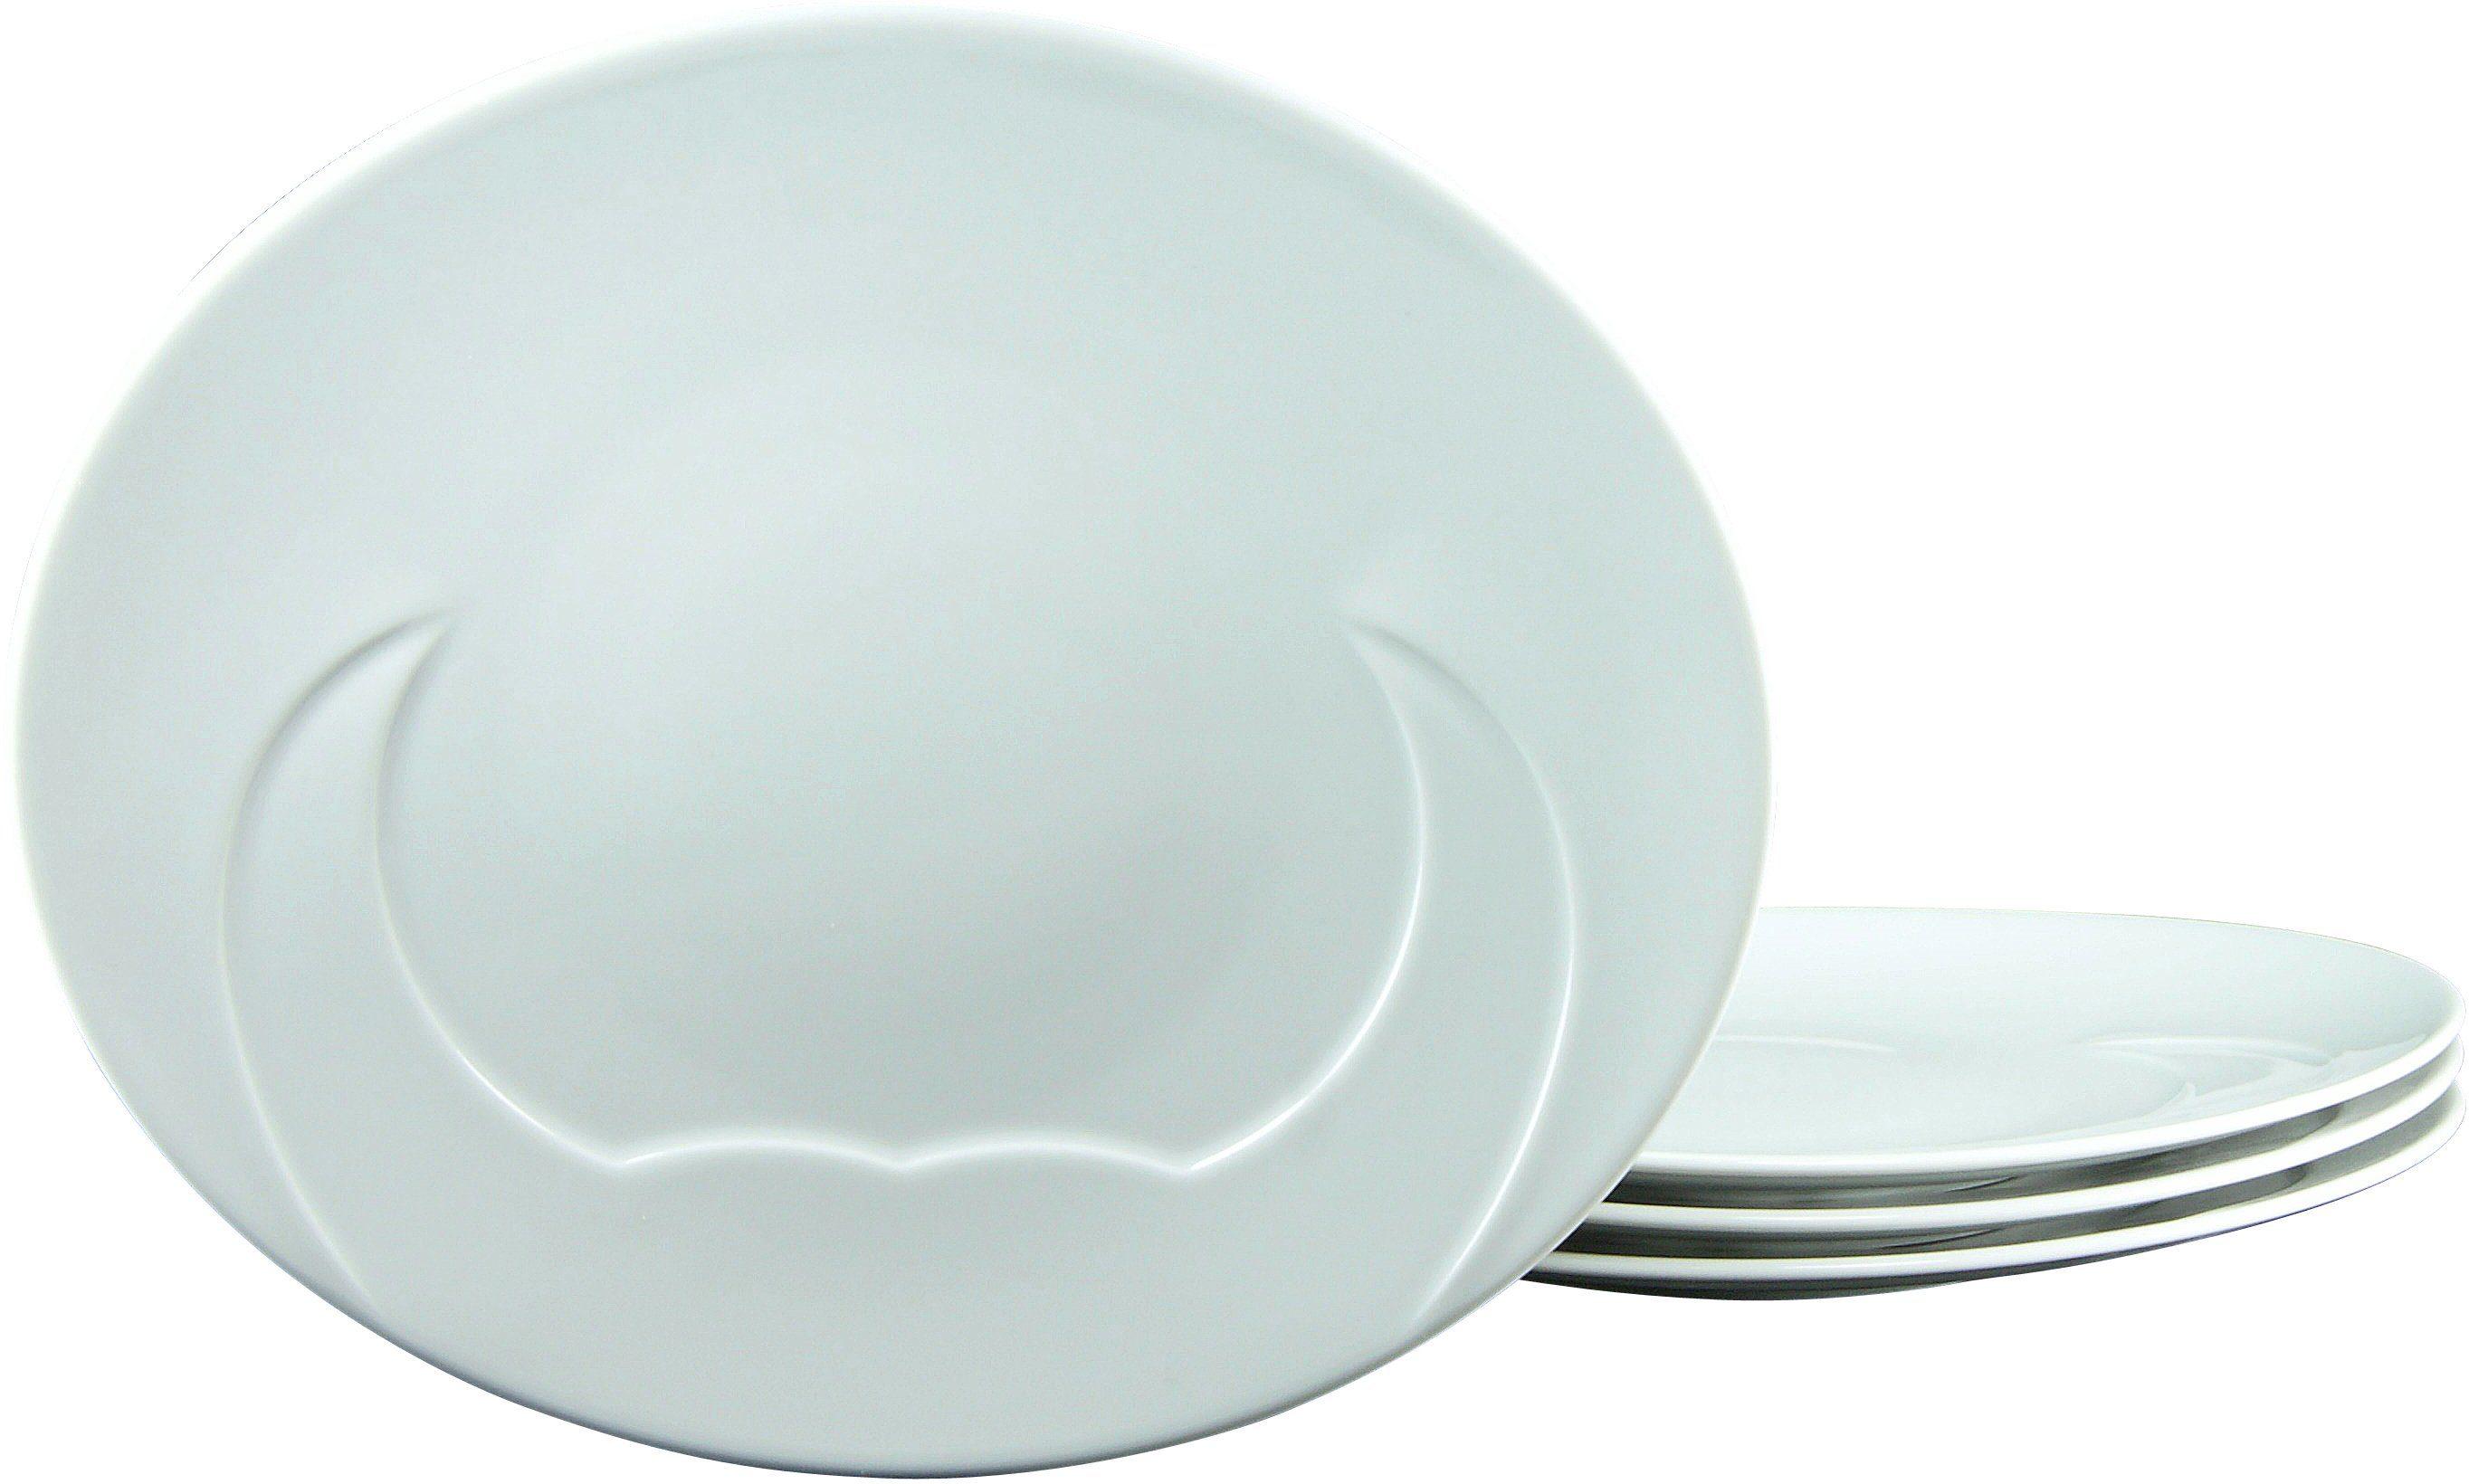 CreaTable Grillteller, Porzellan, 30 cm, »MEAT« (4 Stck.)